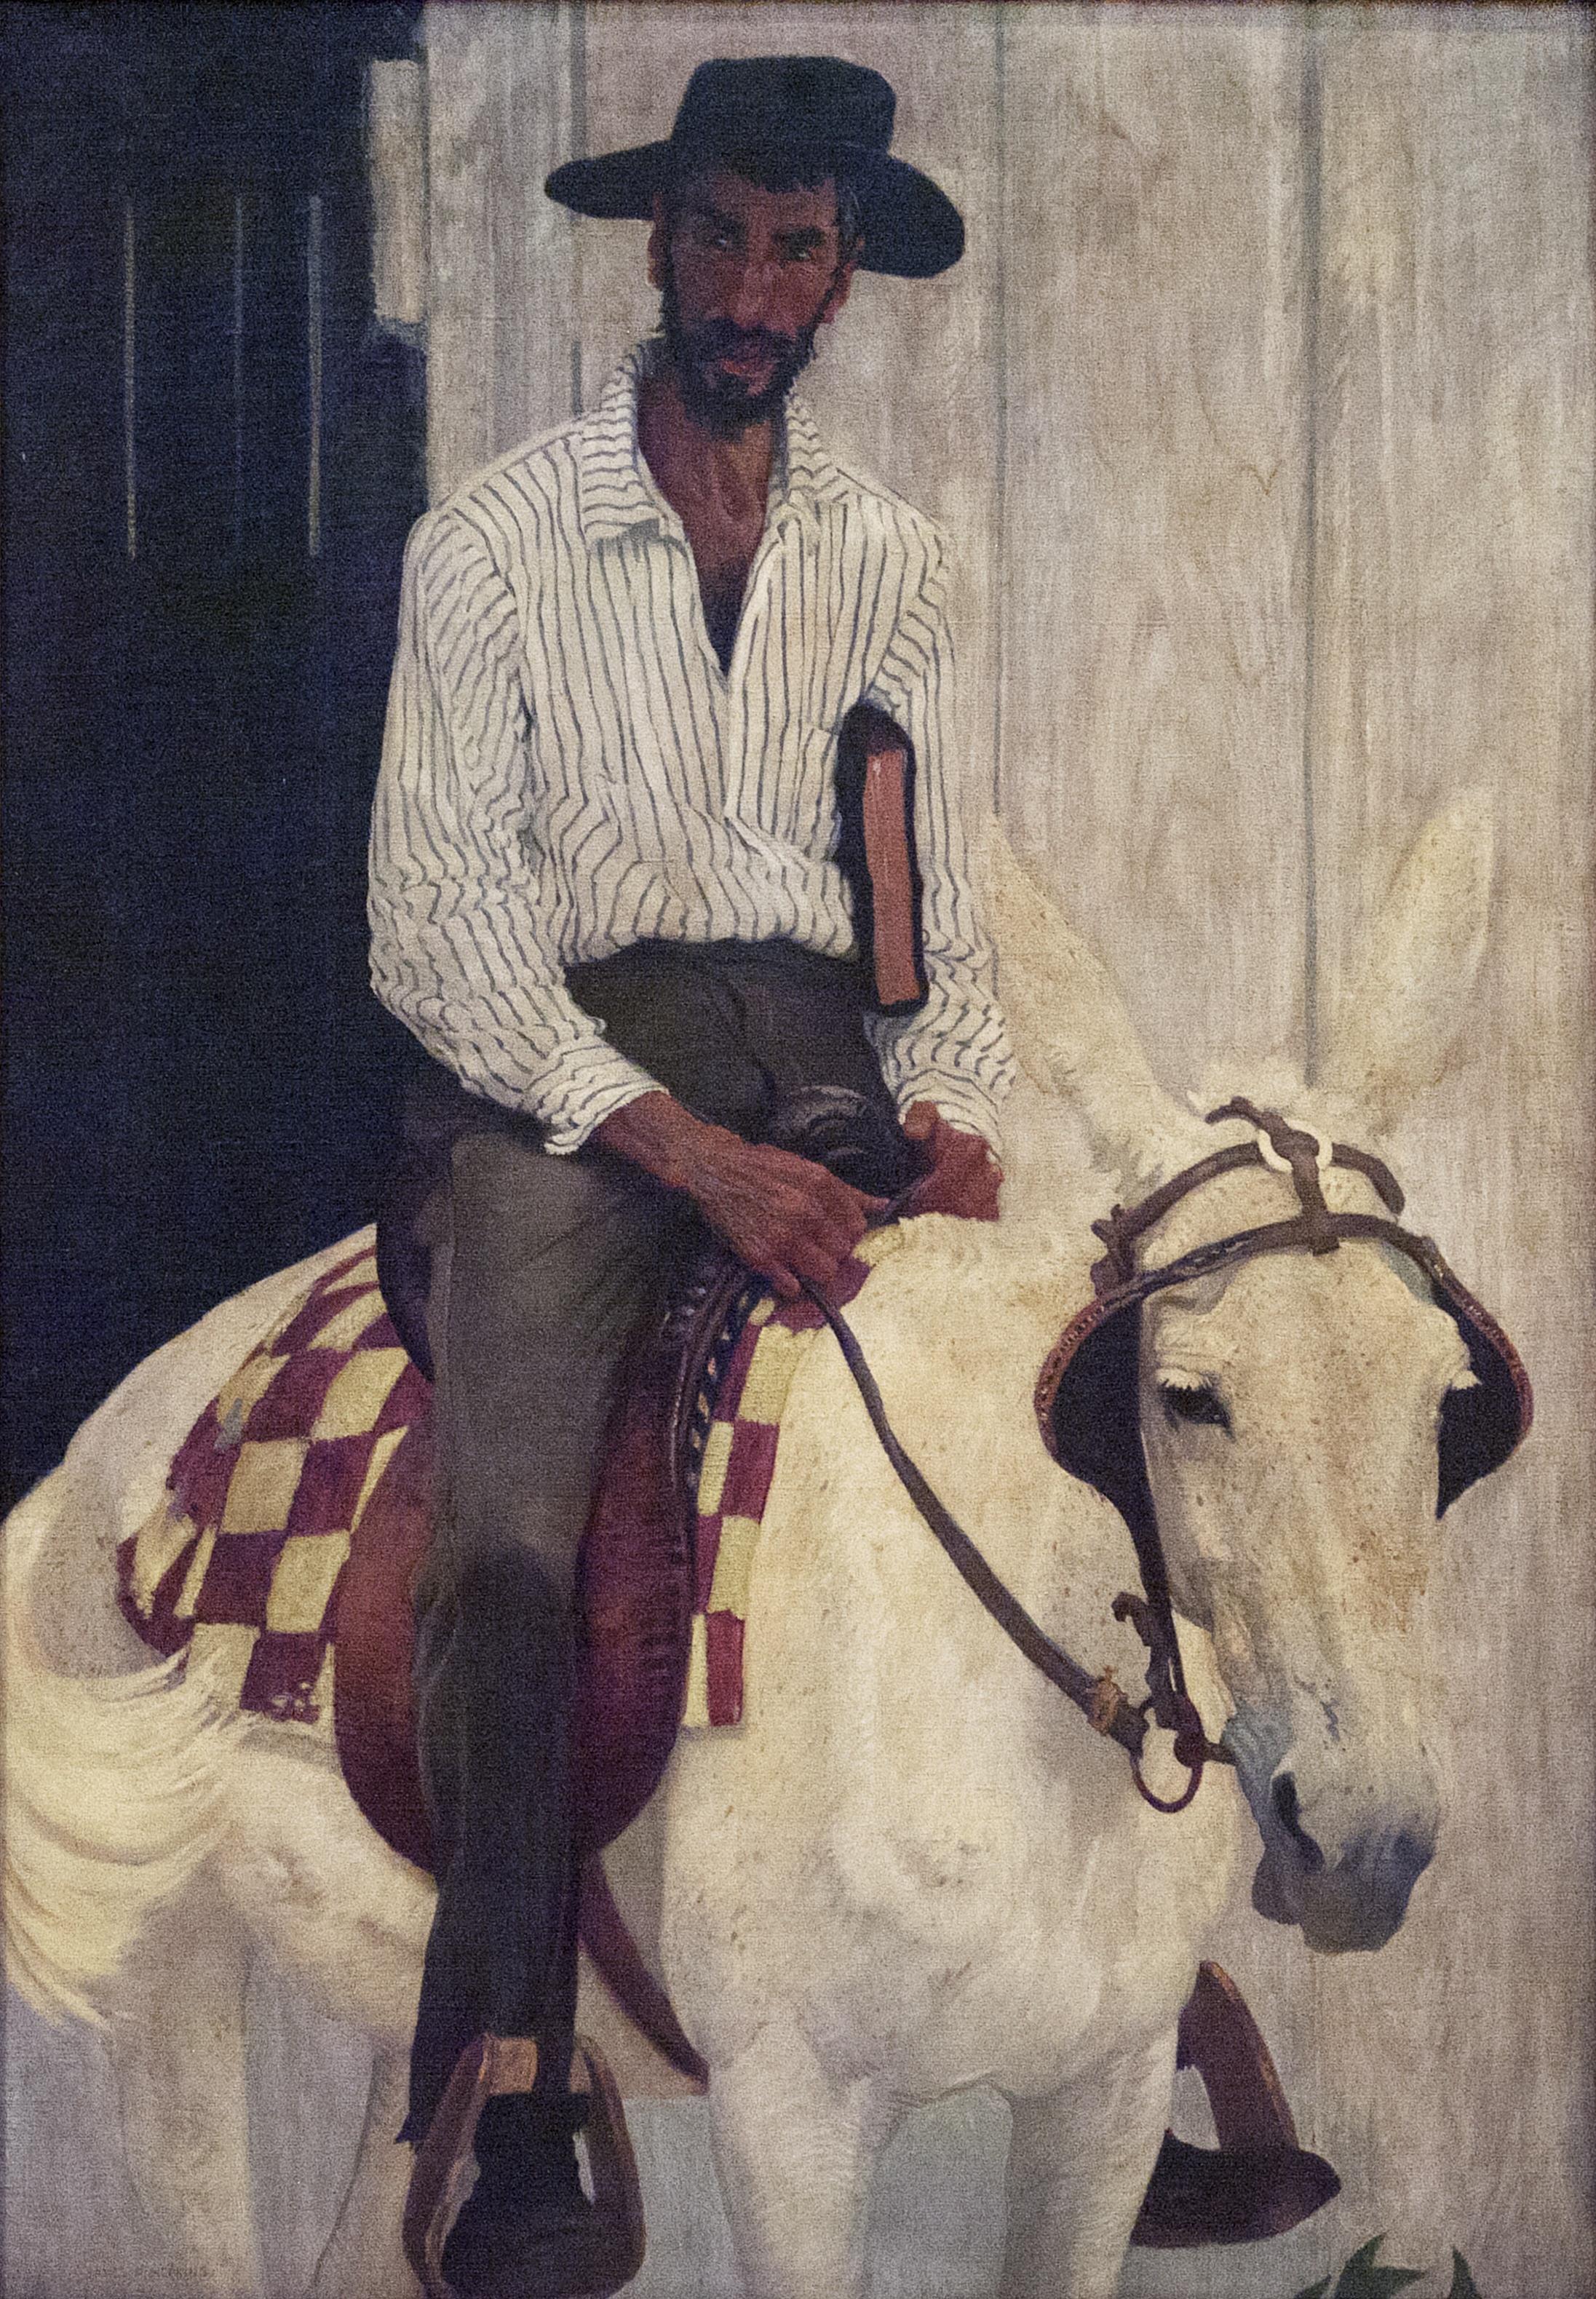 "James R. Hopkins | THE MOUNTAIN PREACHER | oil on canvas | 73-3/8 x 54-1/2"" | 1915-16 | Kentucky Gateway Museum Center"